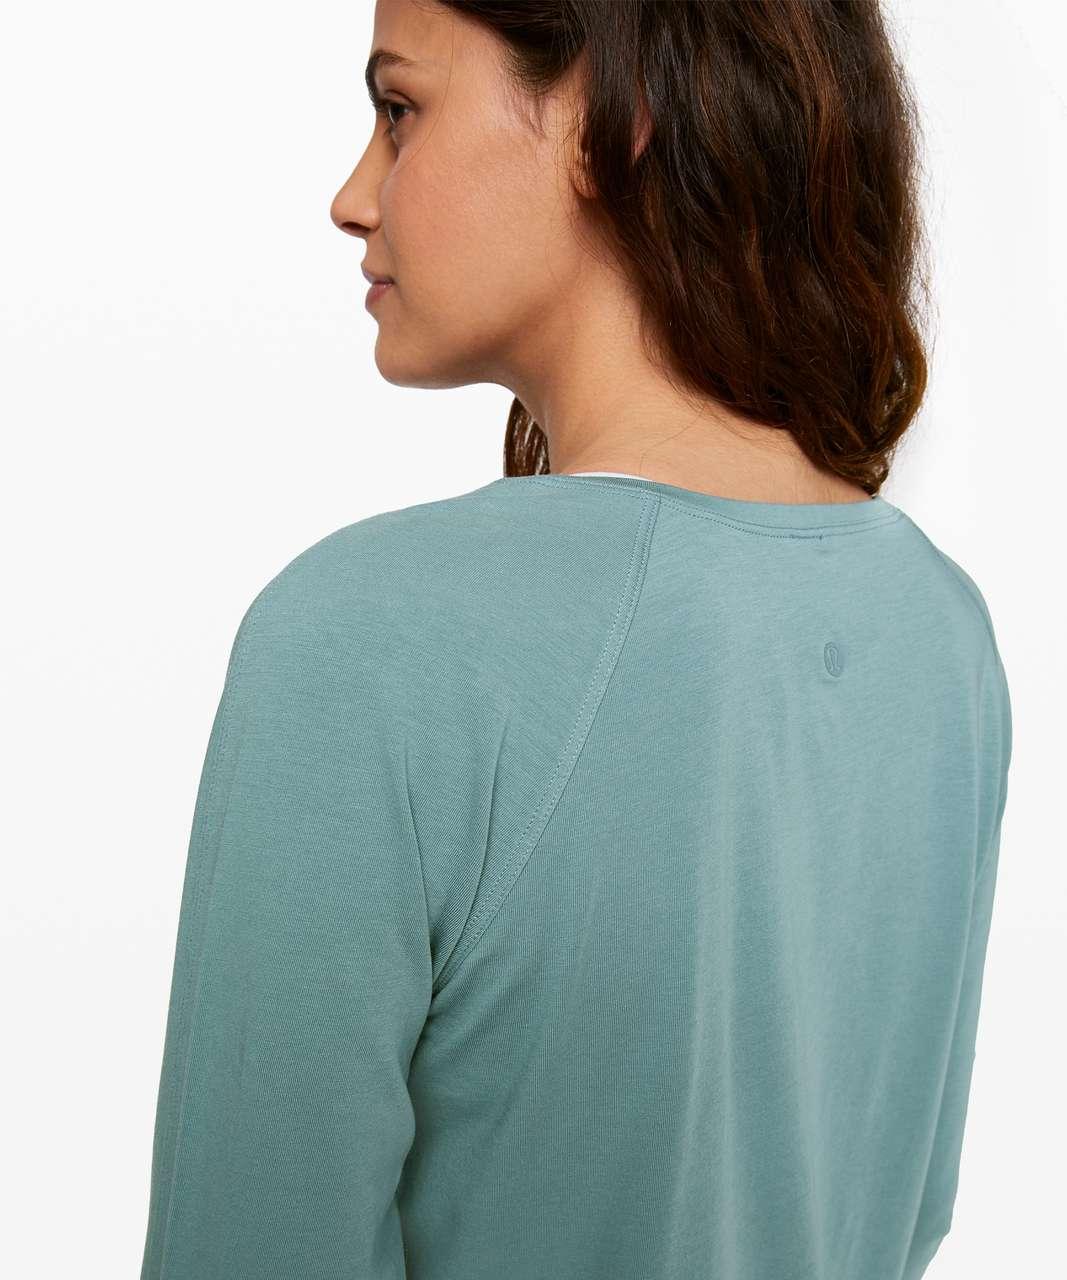 Lululemon Emerald Long Sleeve - Aquatic Green